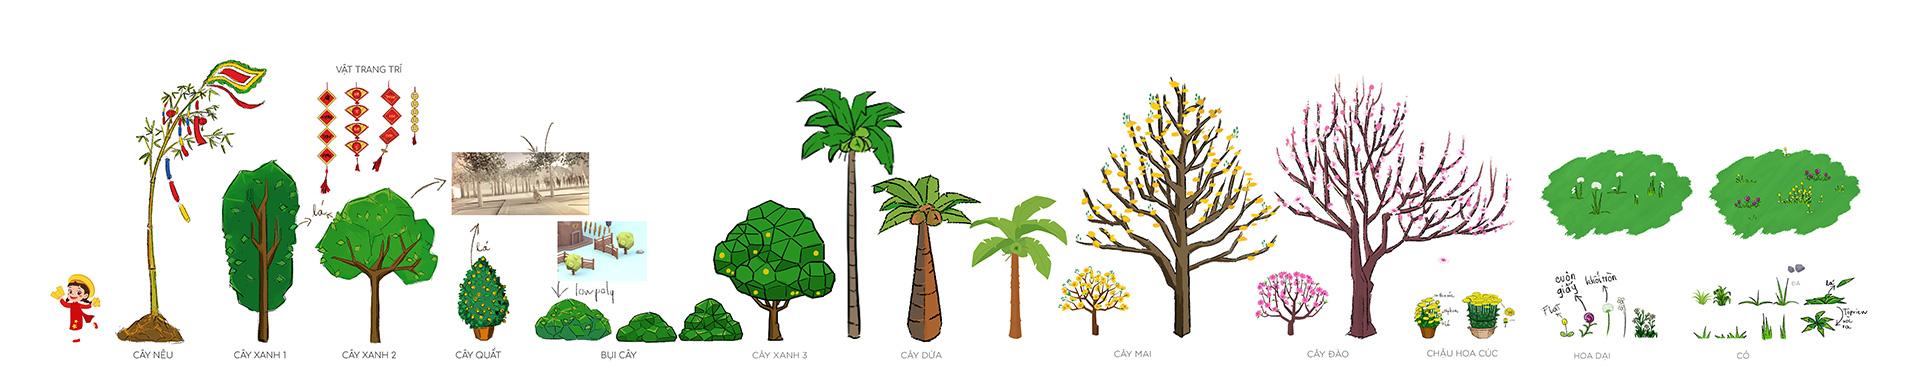 Bitis-Boardgame_Tree.jpg